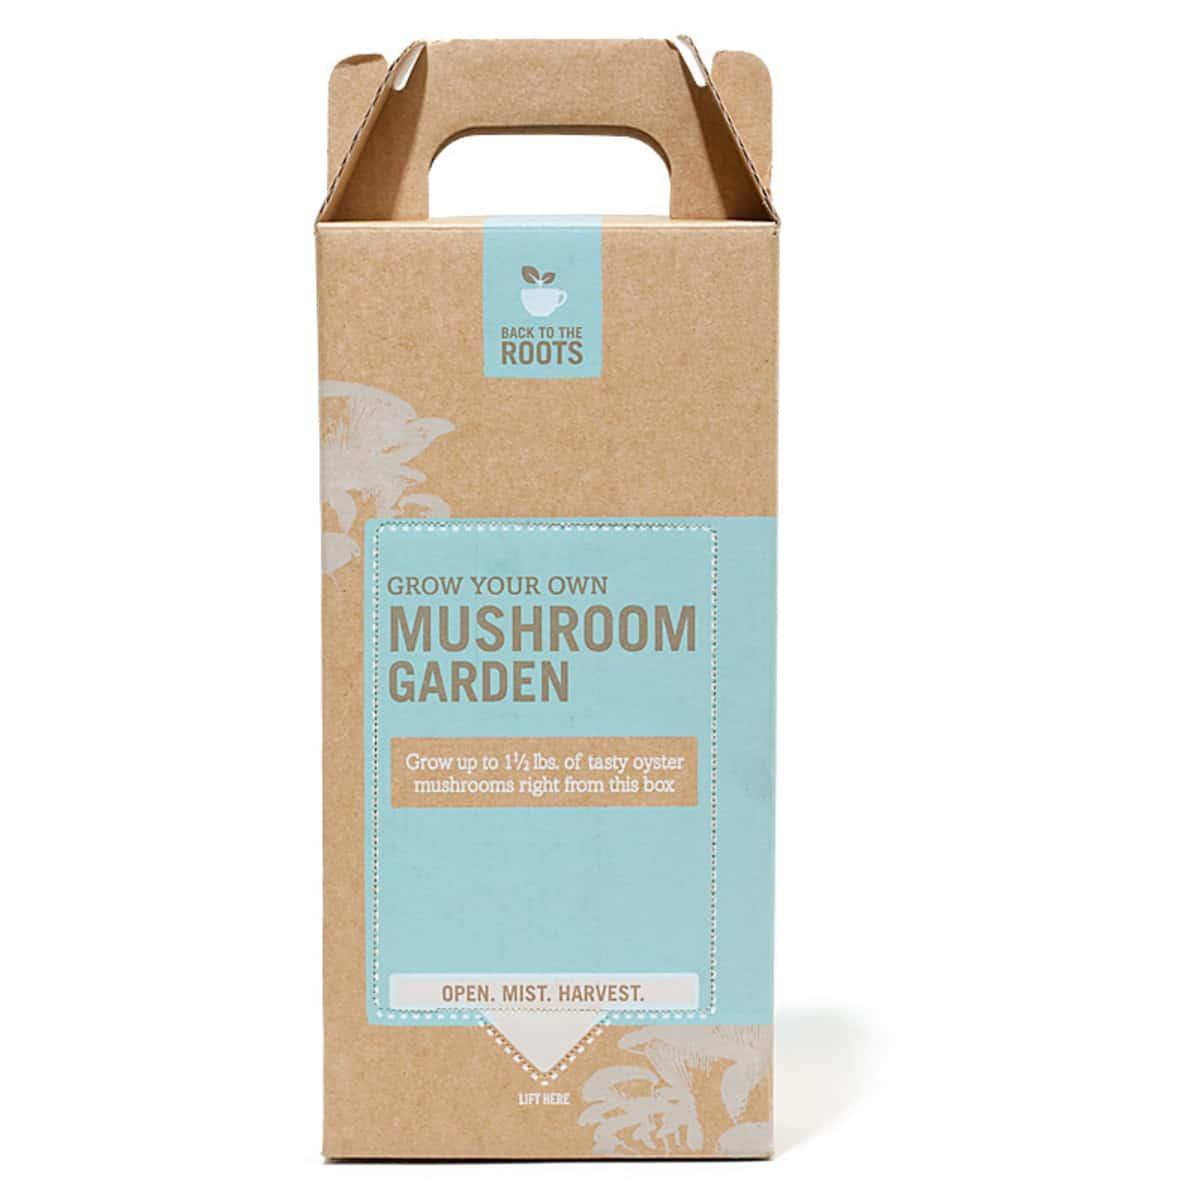 The Best Mushroom Growing Kit | Cook's Illustrated